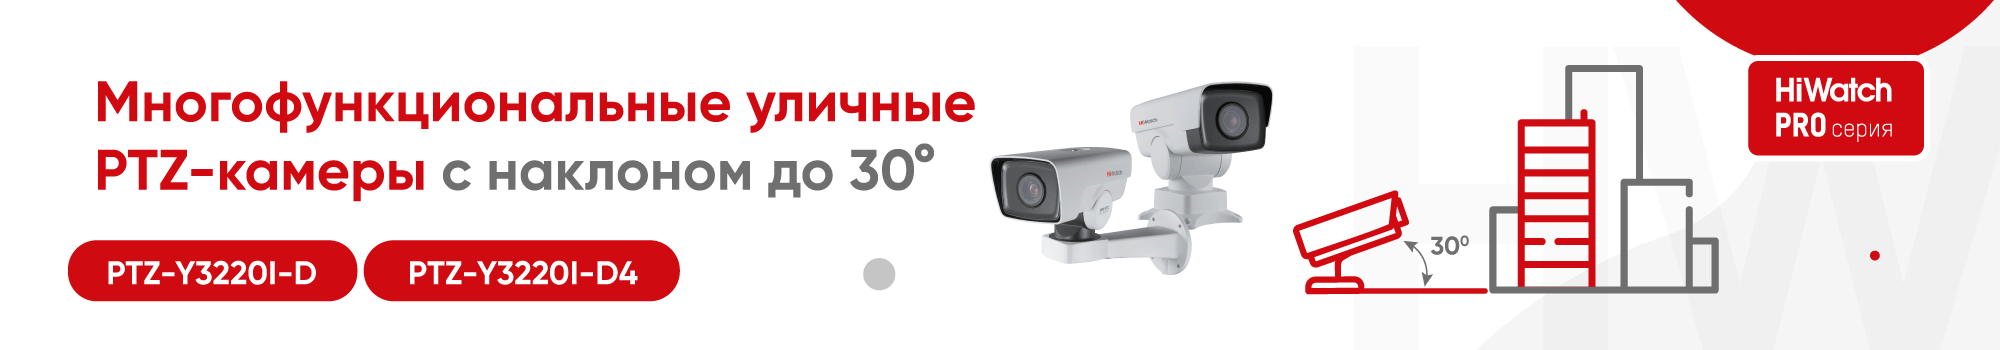 hw-pro--ptz----30-_new-2000x350